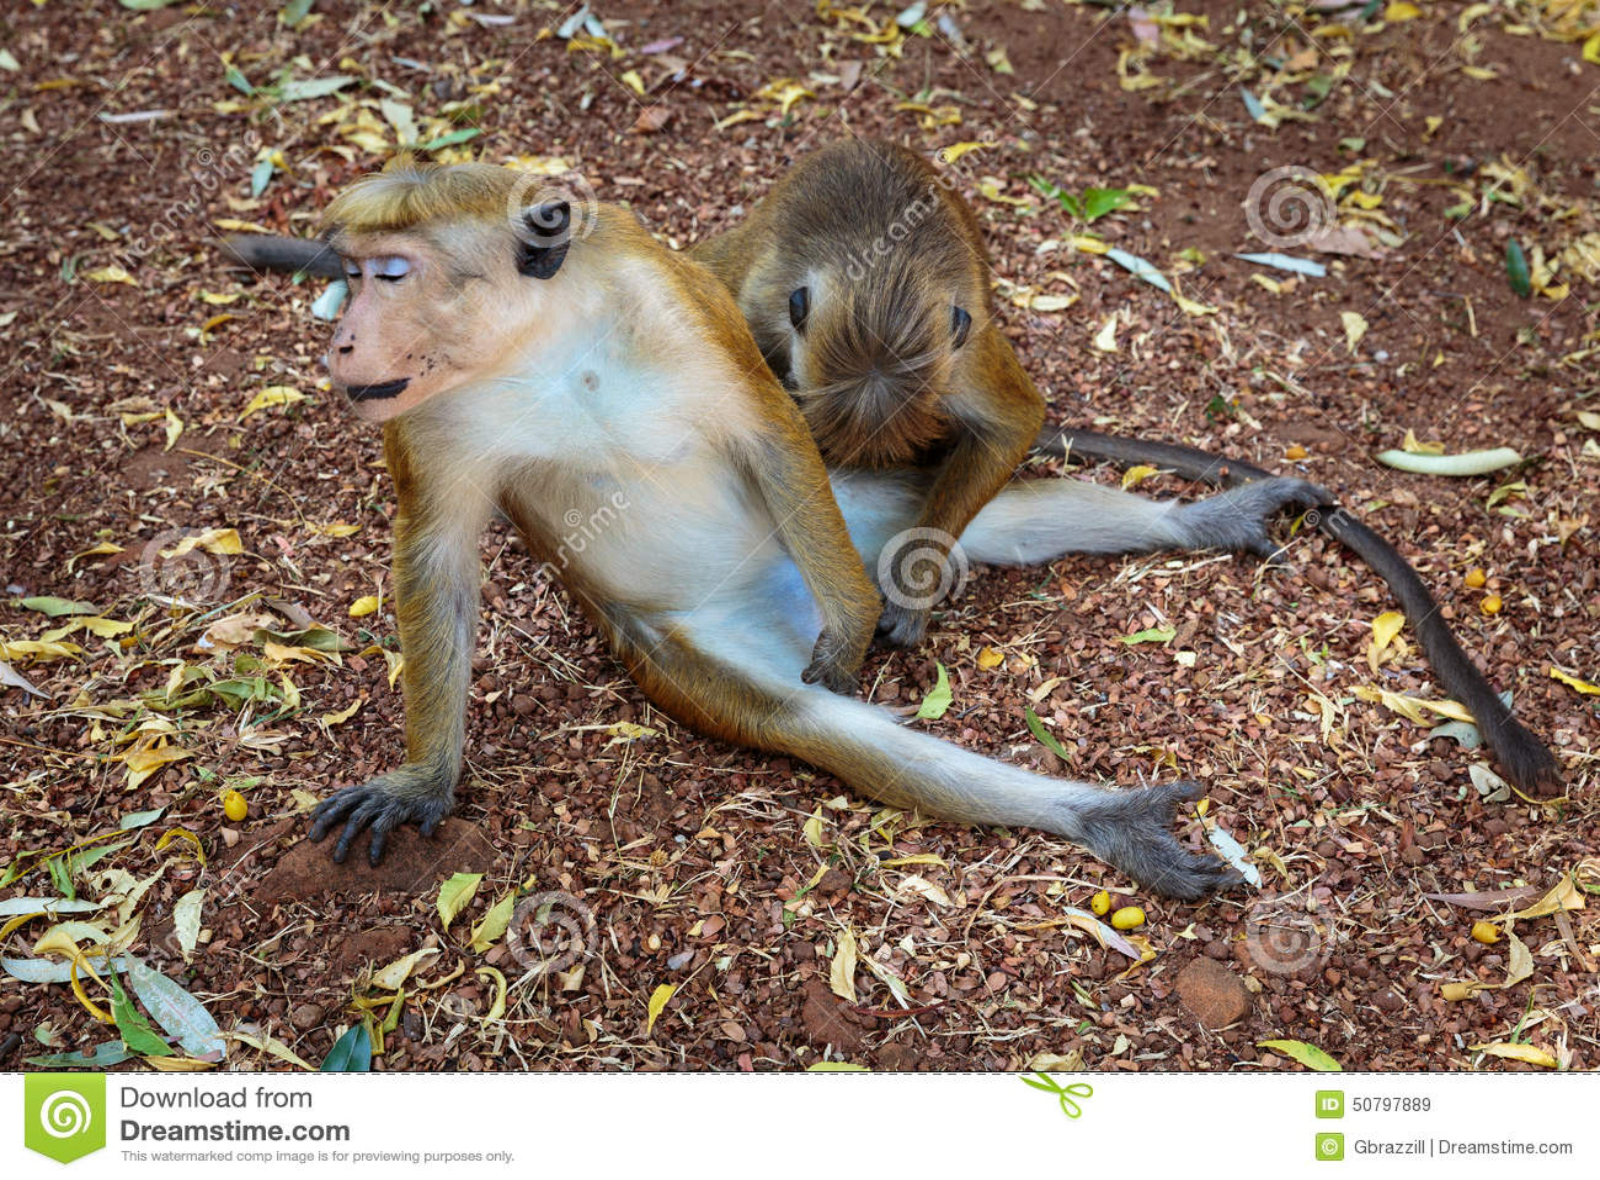 monkey free sex videos